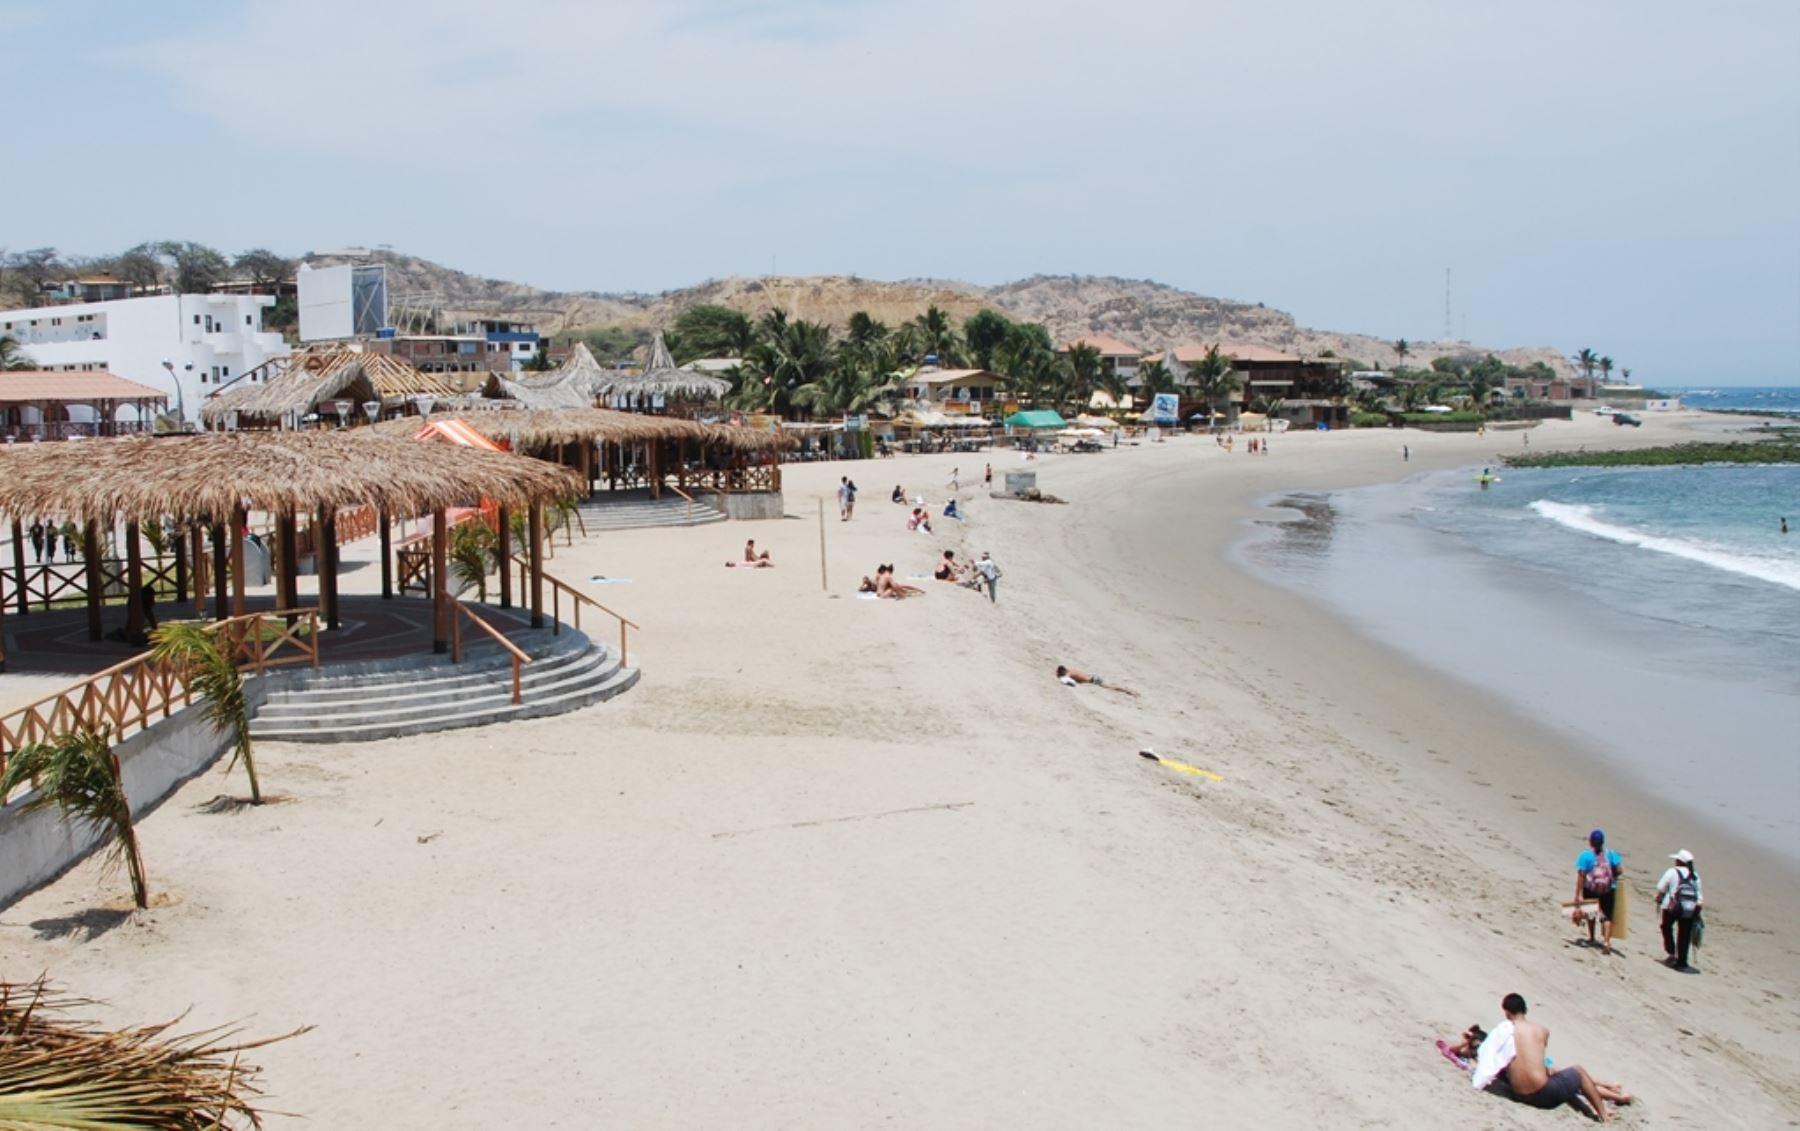 Reportaron mayor número de turistas ecuatorianos en Tumbes. ANDINA/Archivo